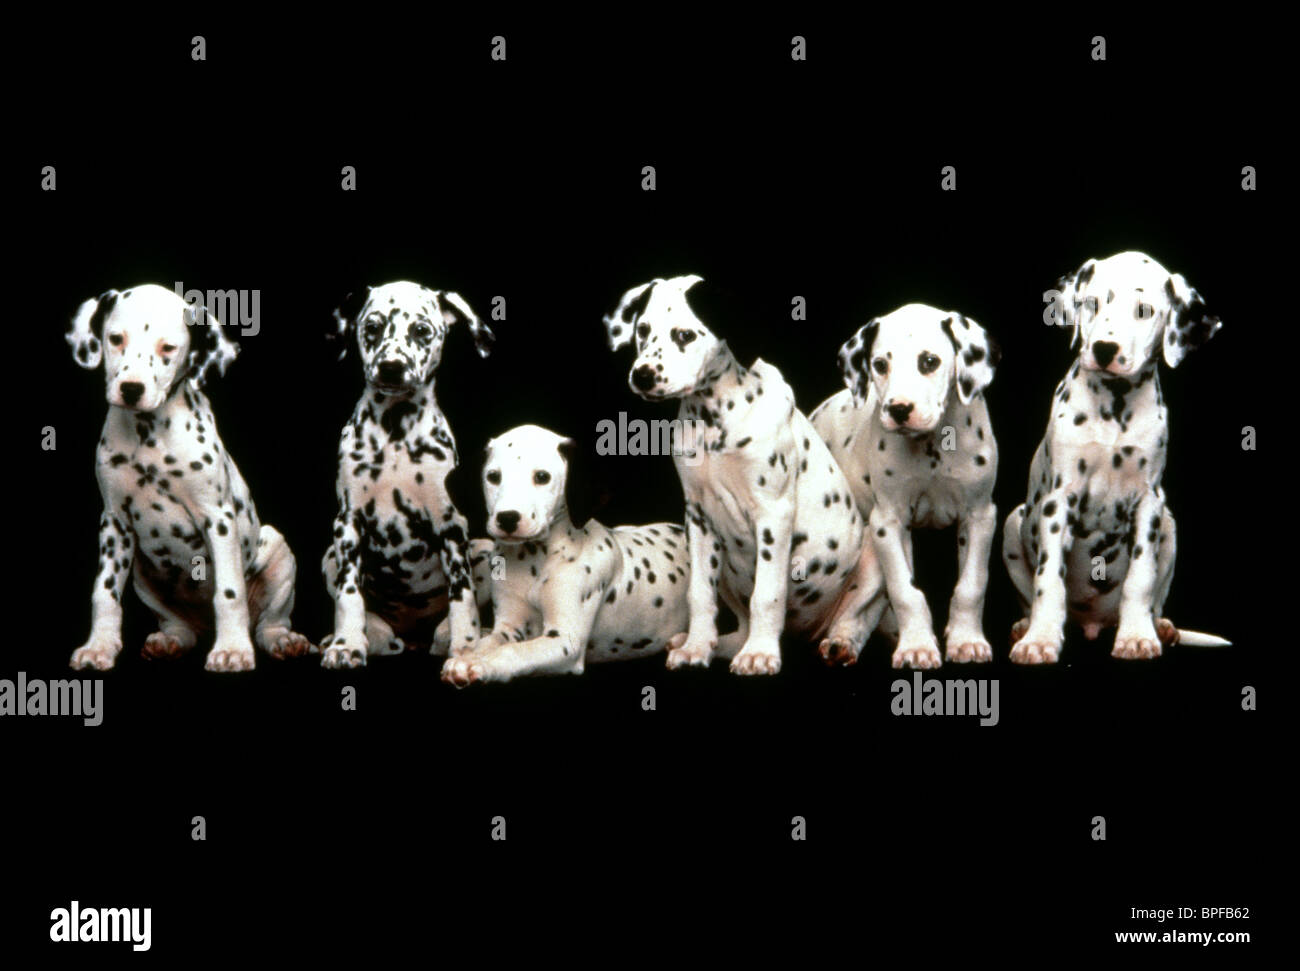 Dalmatian Puppies 101 Dalmatians 1996 Stock Photo